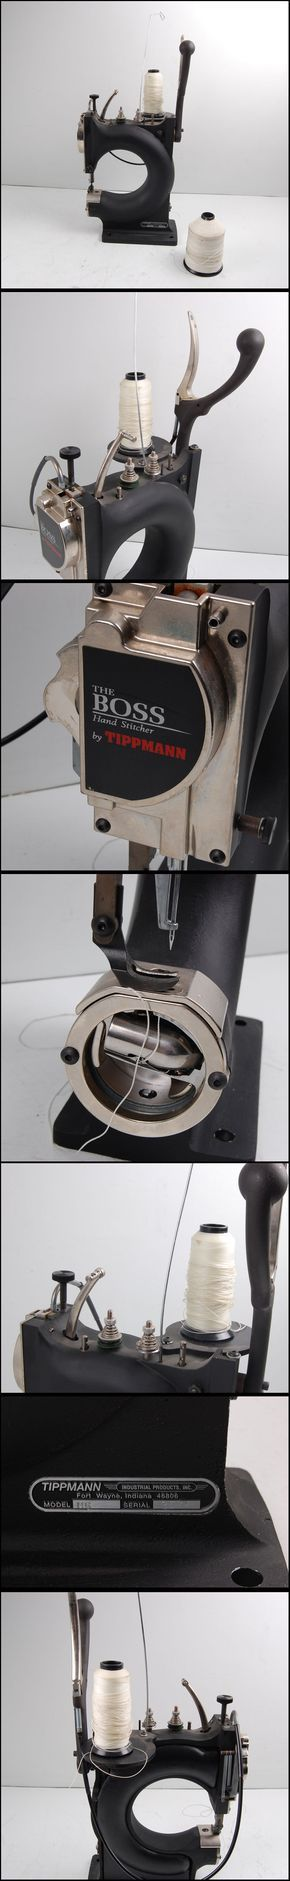 Tippmann Boss Model HS Hand Stitcher Leather Sewing Machine Máquina de coser fabricación en acero bastante robusta y muy bien fabricada